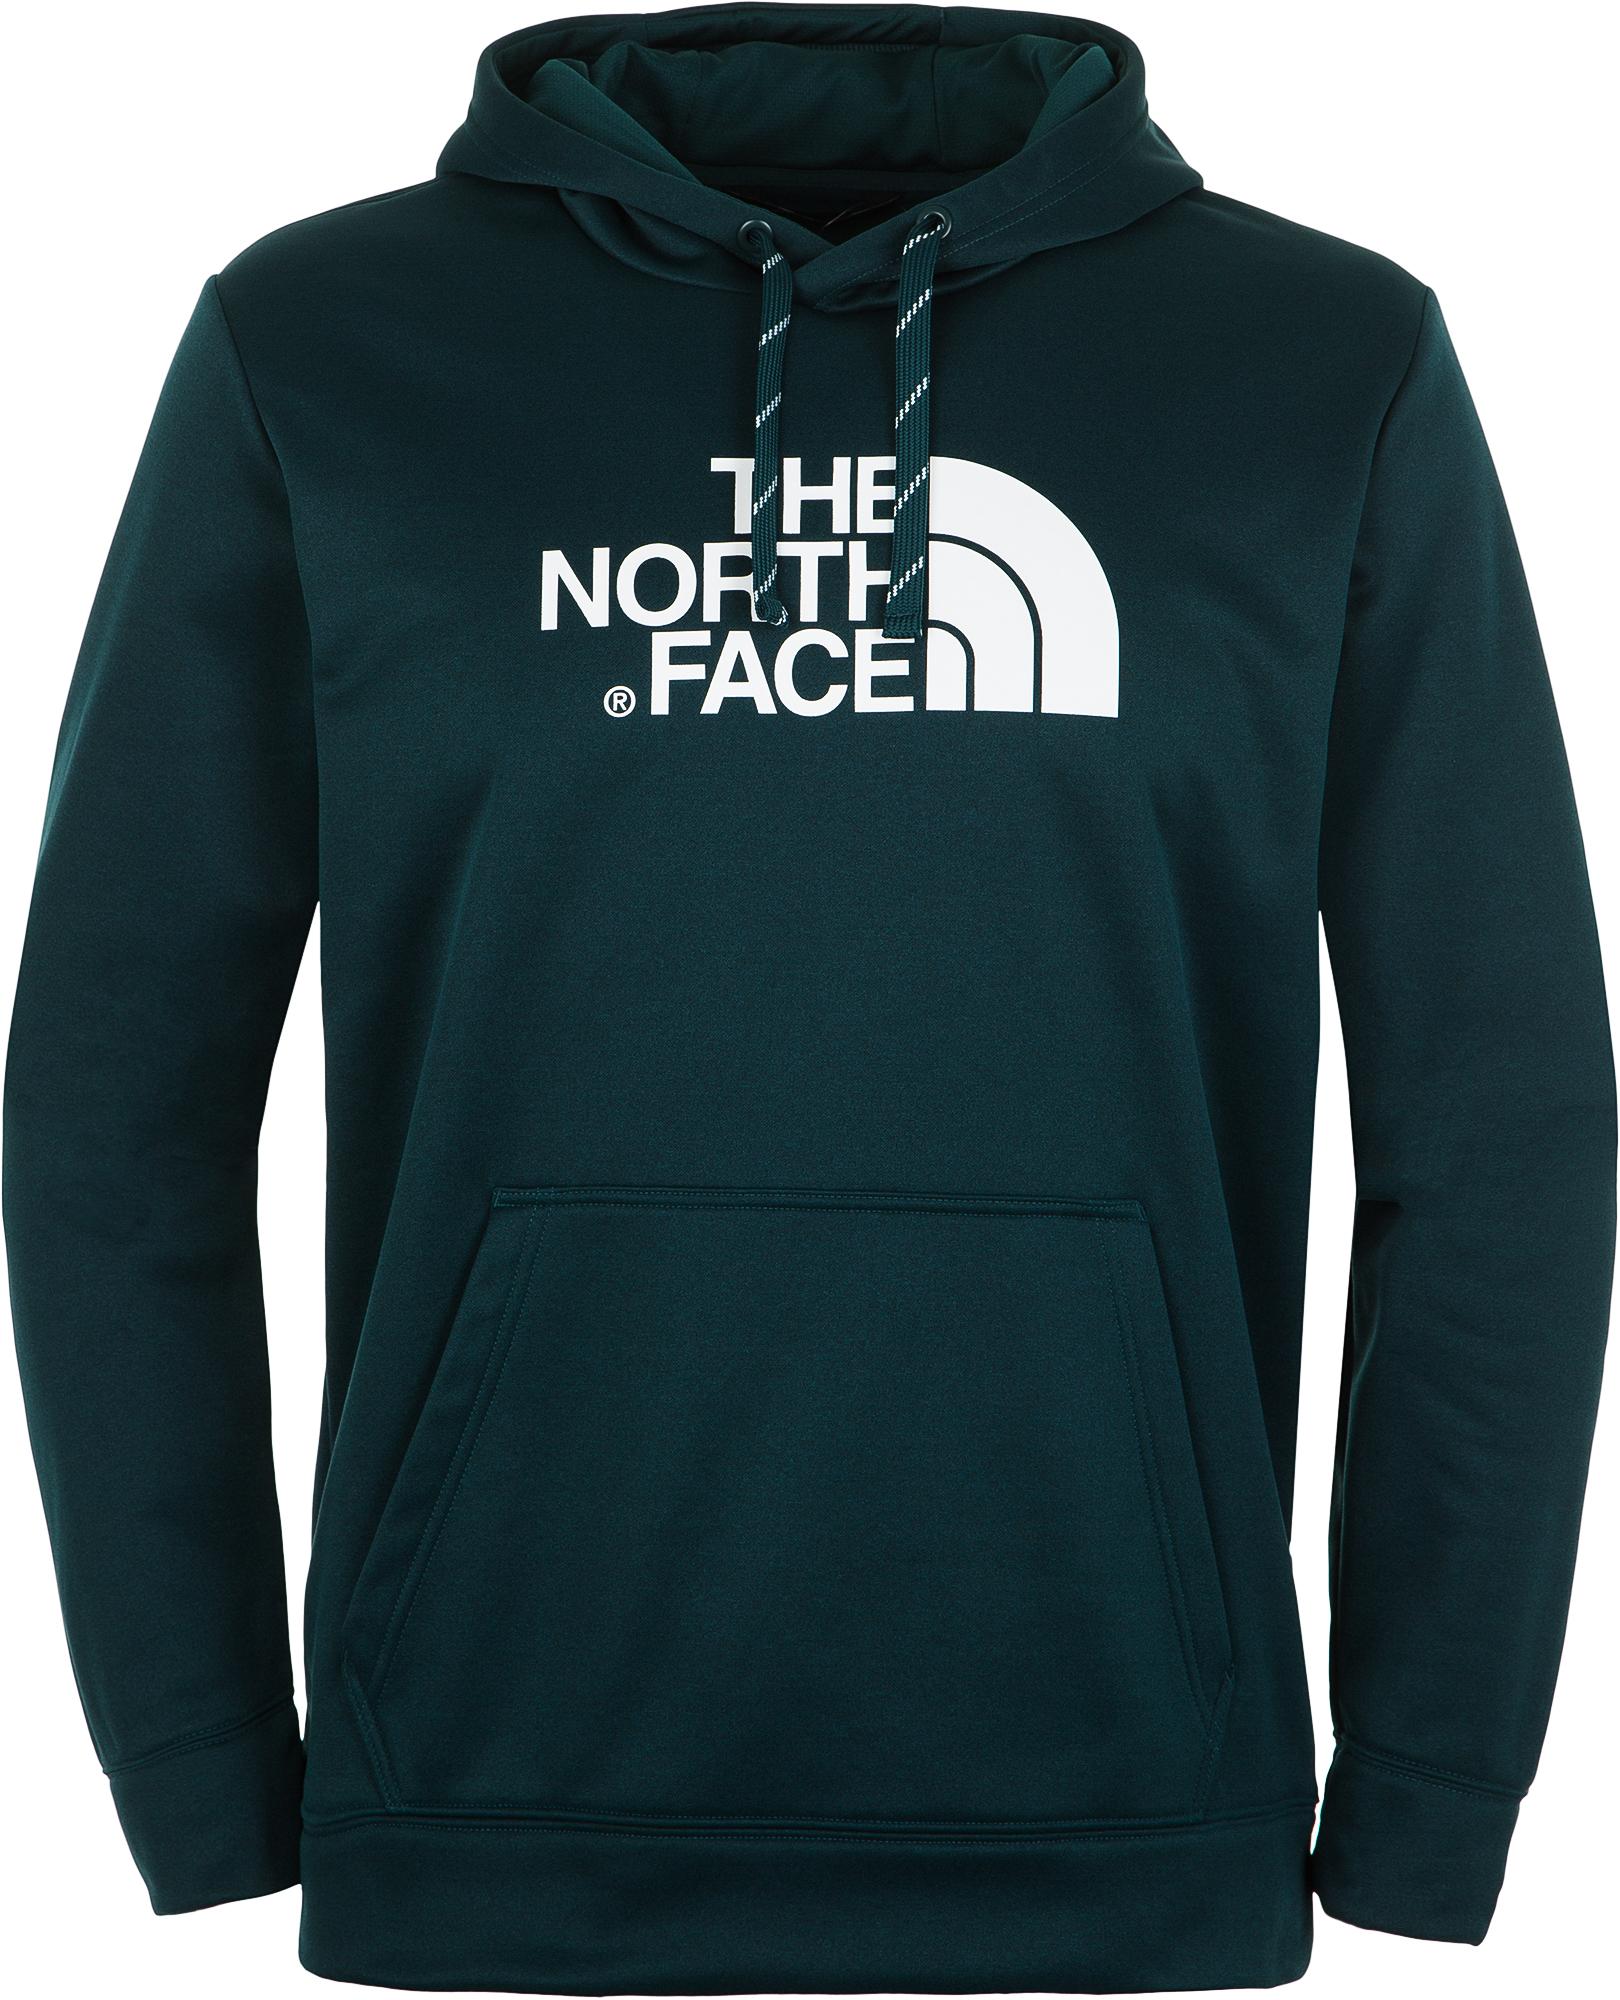 The North Face Худи мужская Surgent, размер 52